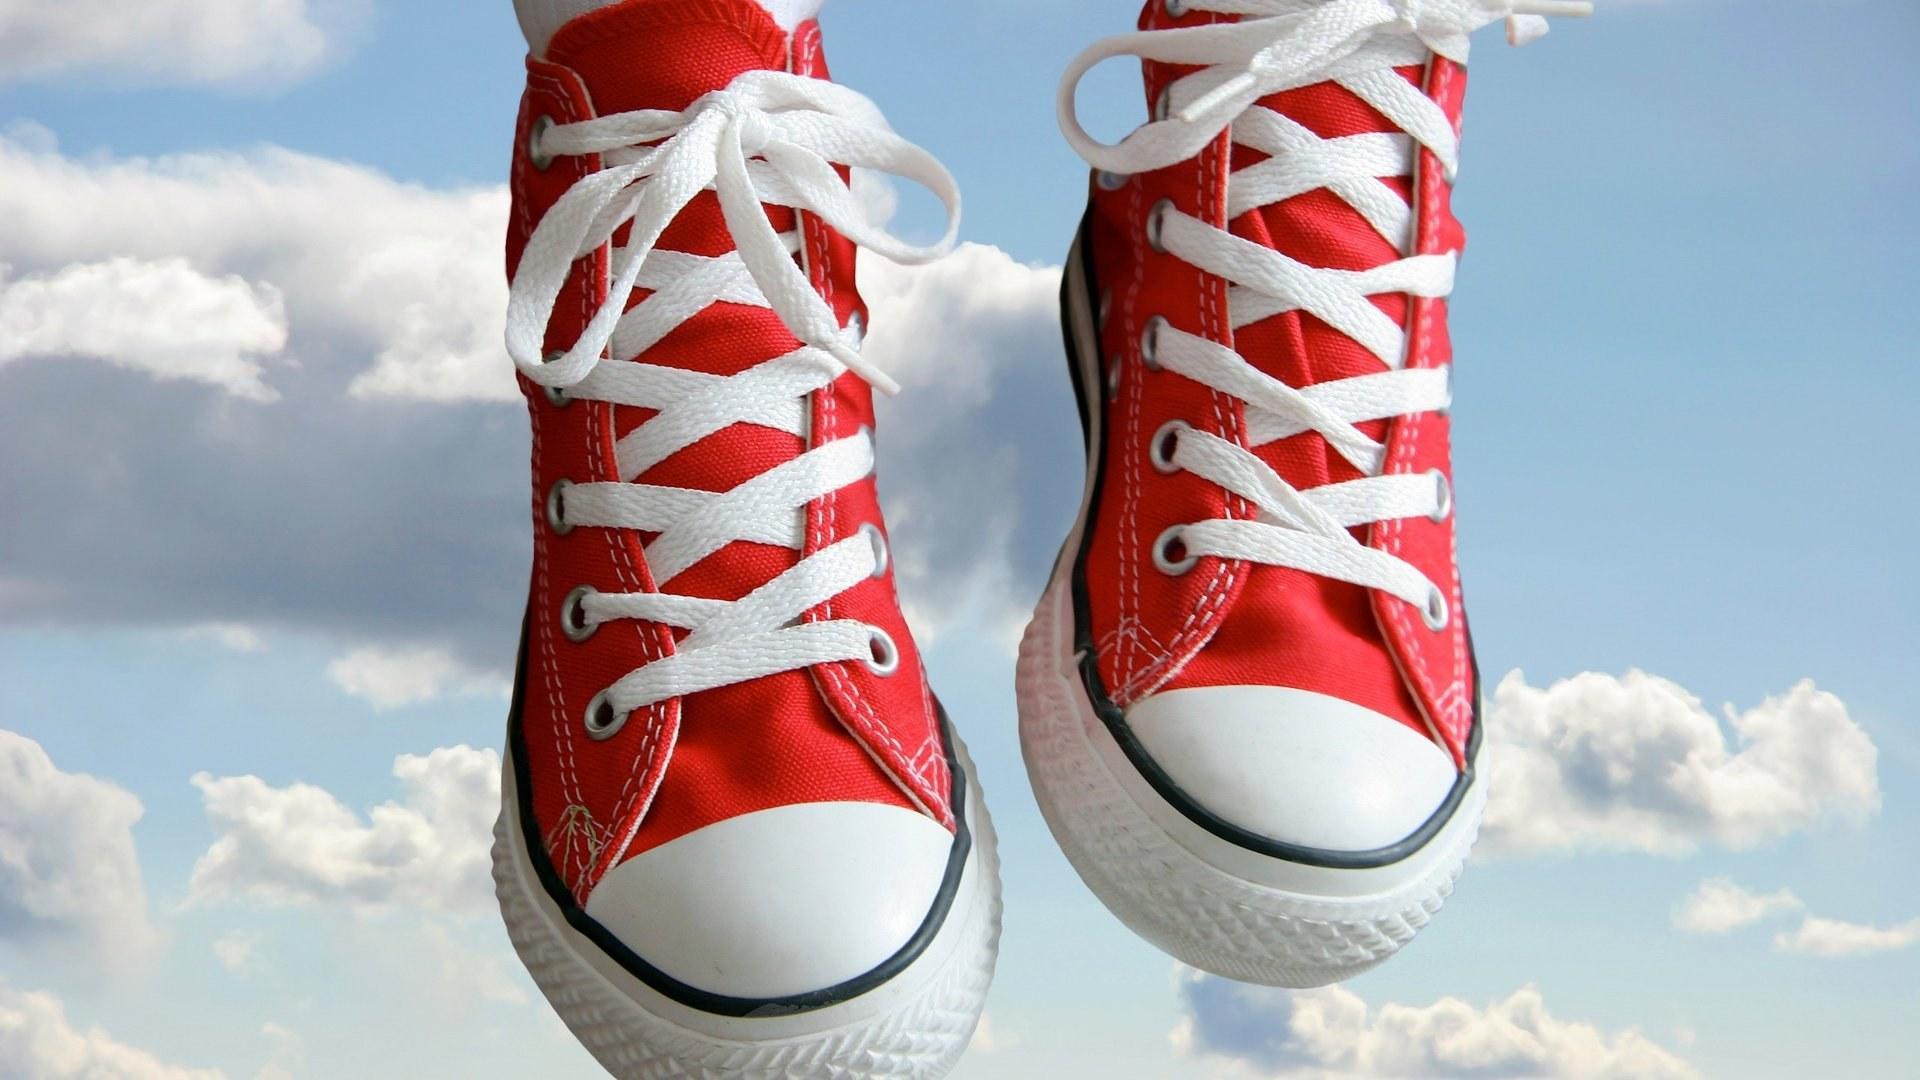 Wallpaper Shoelaces Plimsoll shoe Creative bootlaces shoestrings